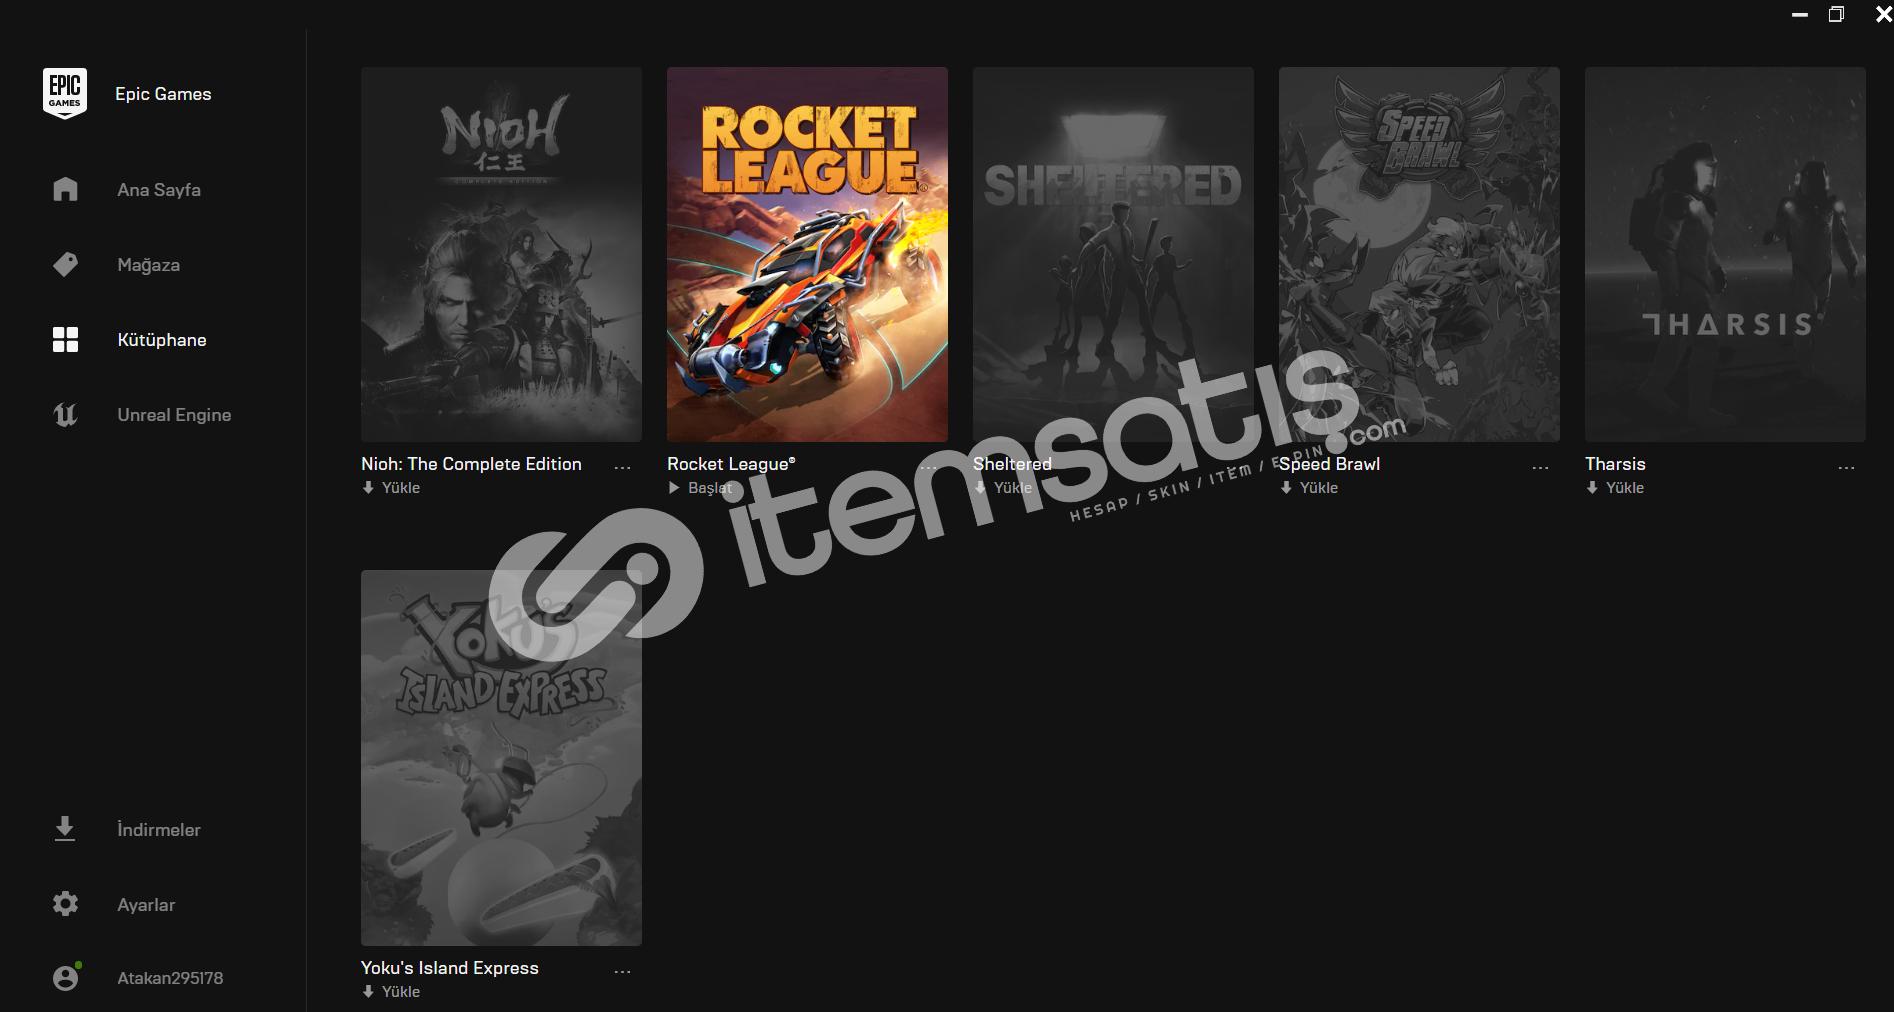 Epic Games 363 TL Hesap!!!